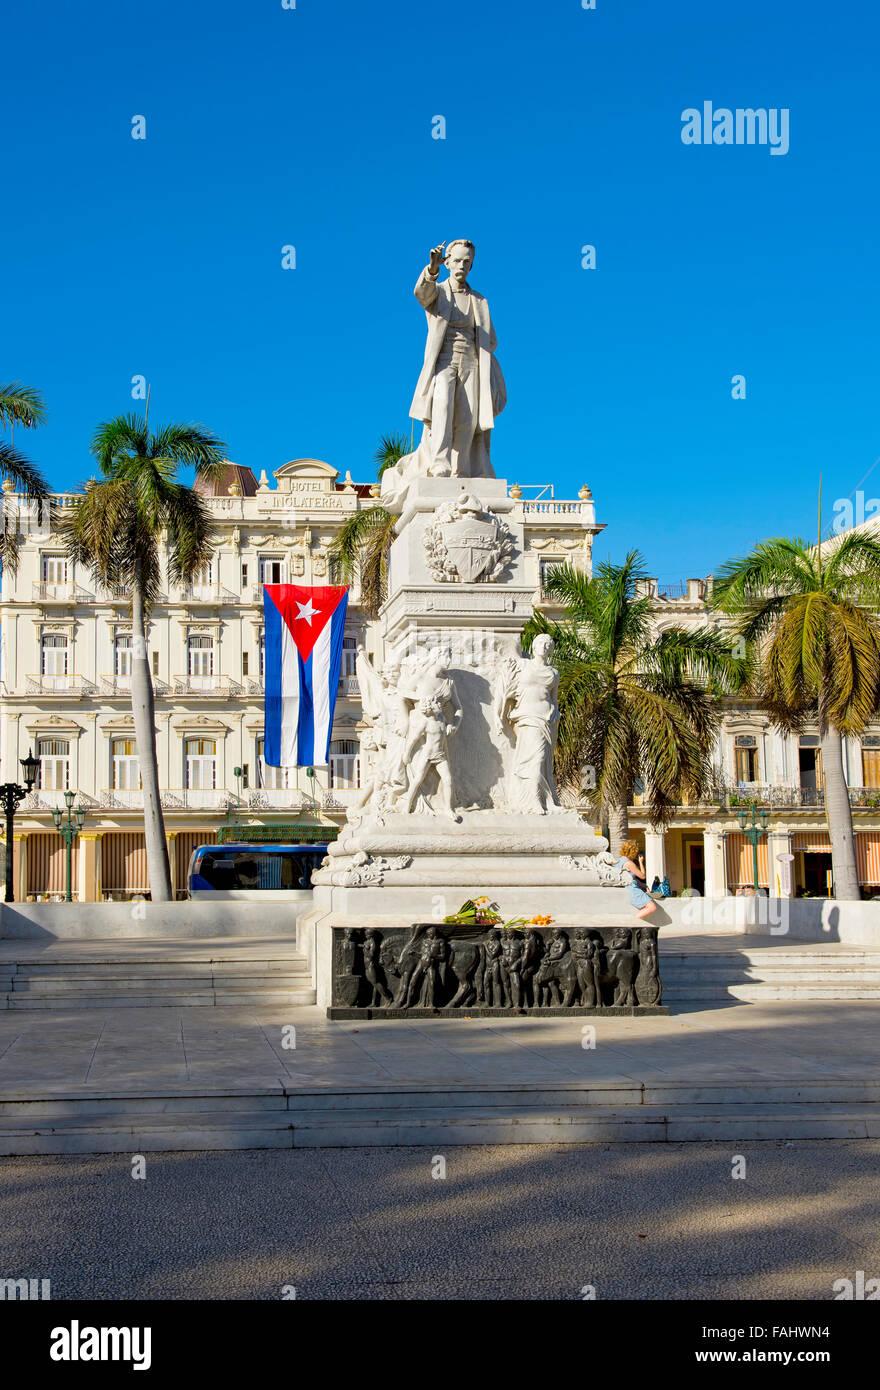 Jose Marti statue, in front of Inglaterra Hotel, Havana, Cuba - Stock Image